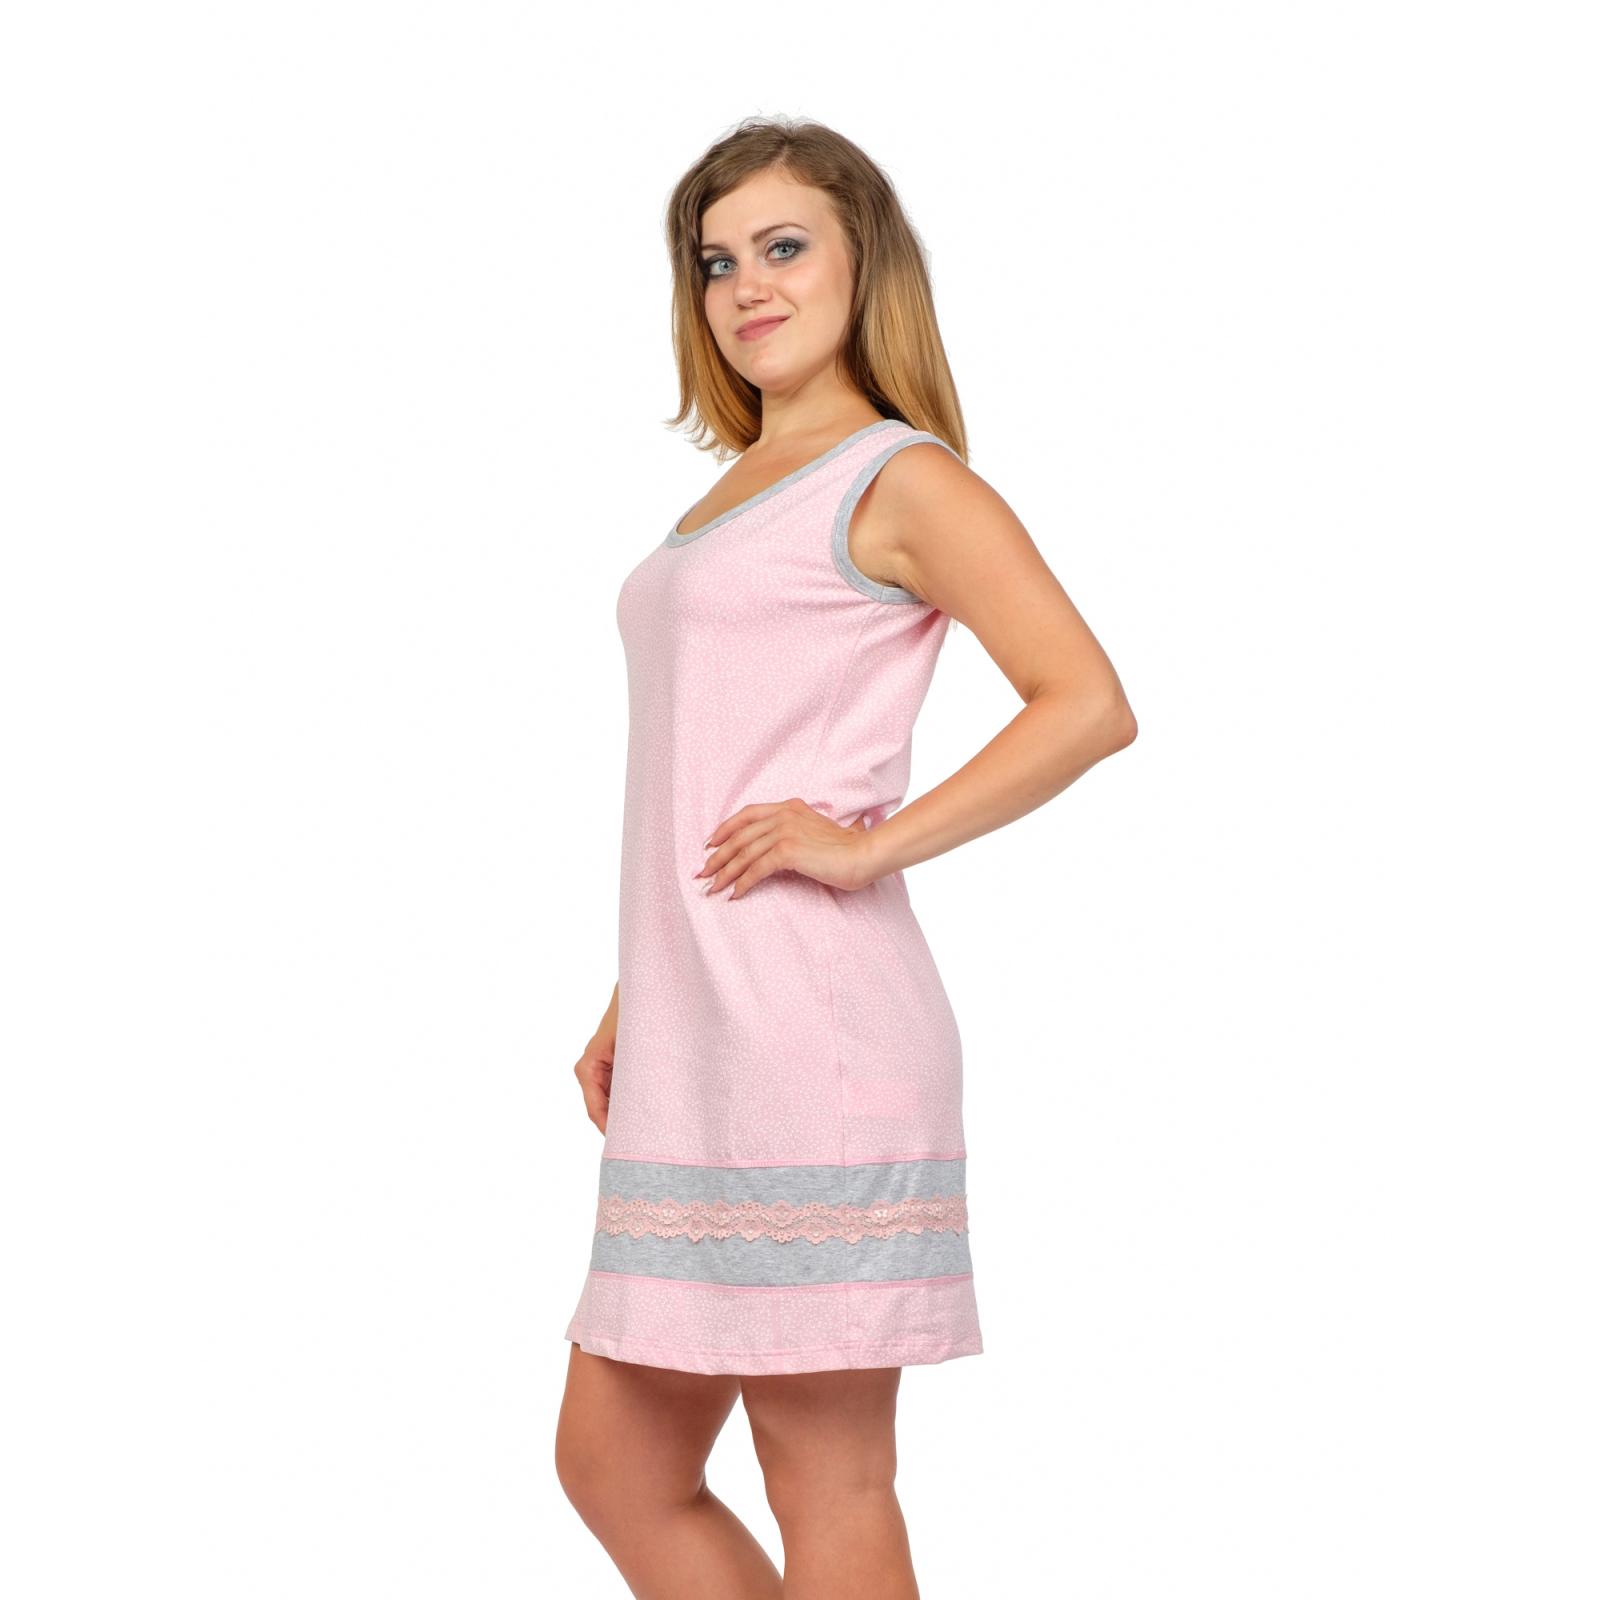 Сорочка розовая Алина М-0125Р